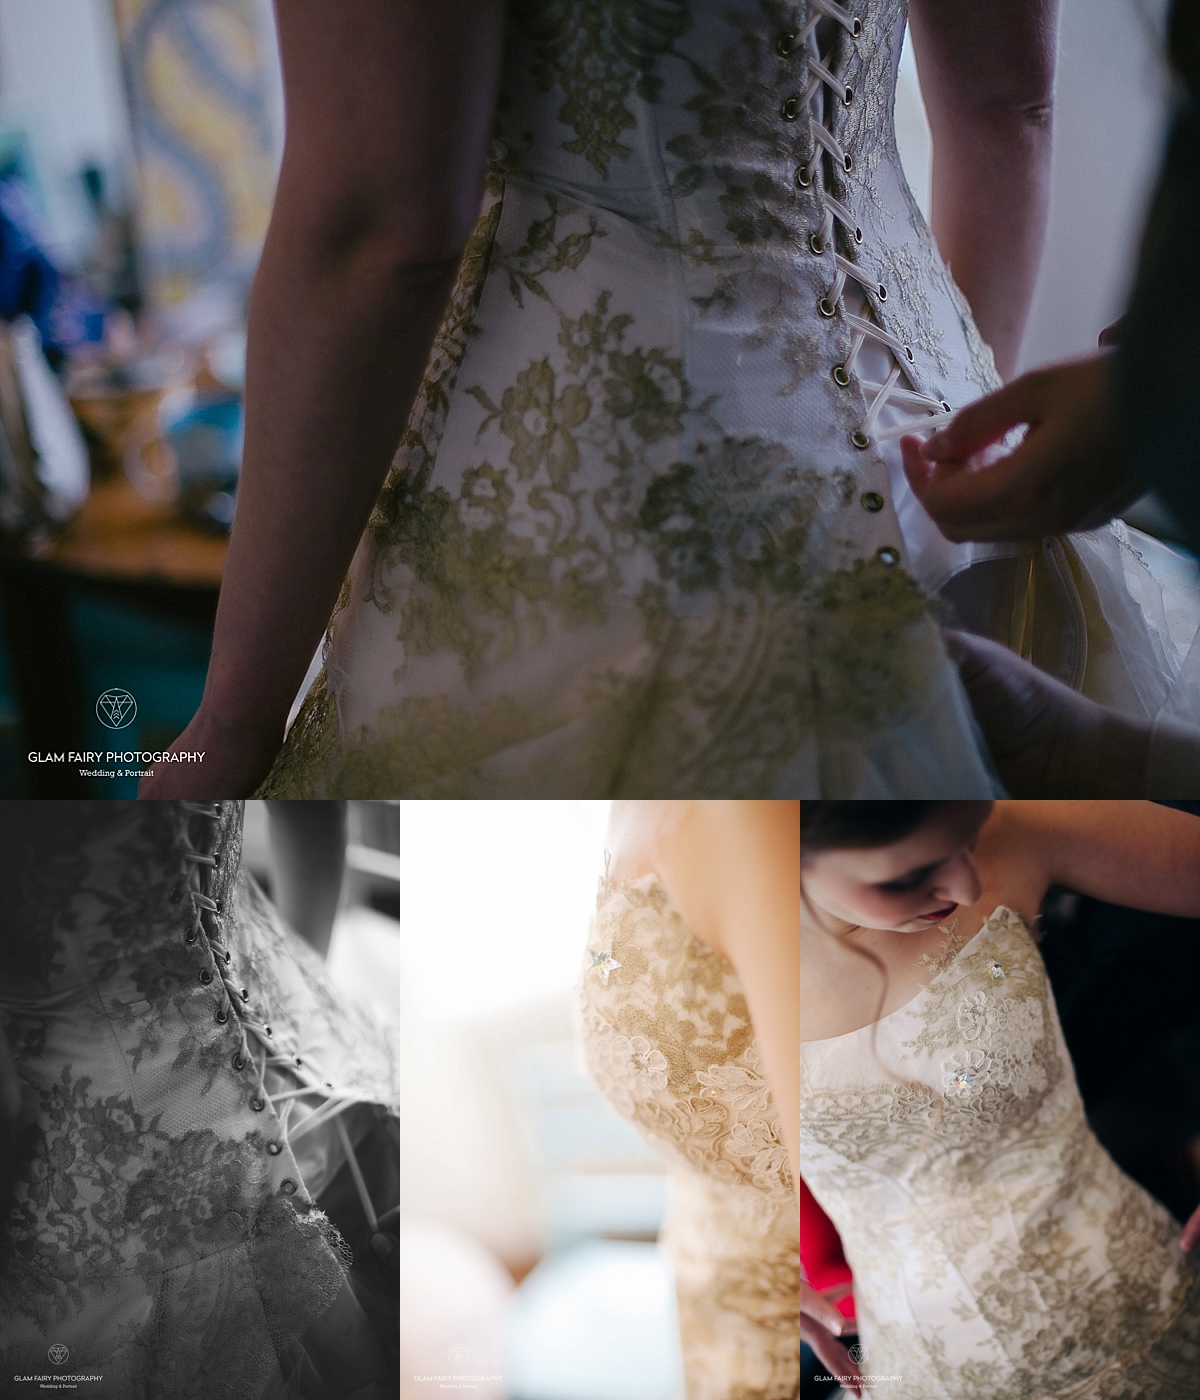 GlamFairyPhotography-mariage-hiver-pressigny-les-pins-aryz_0006